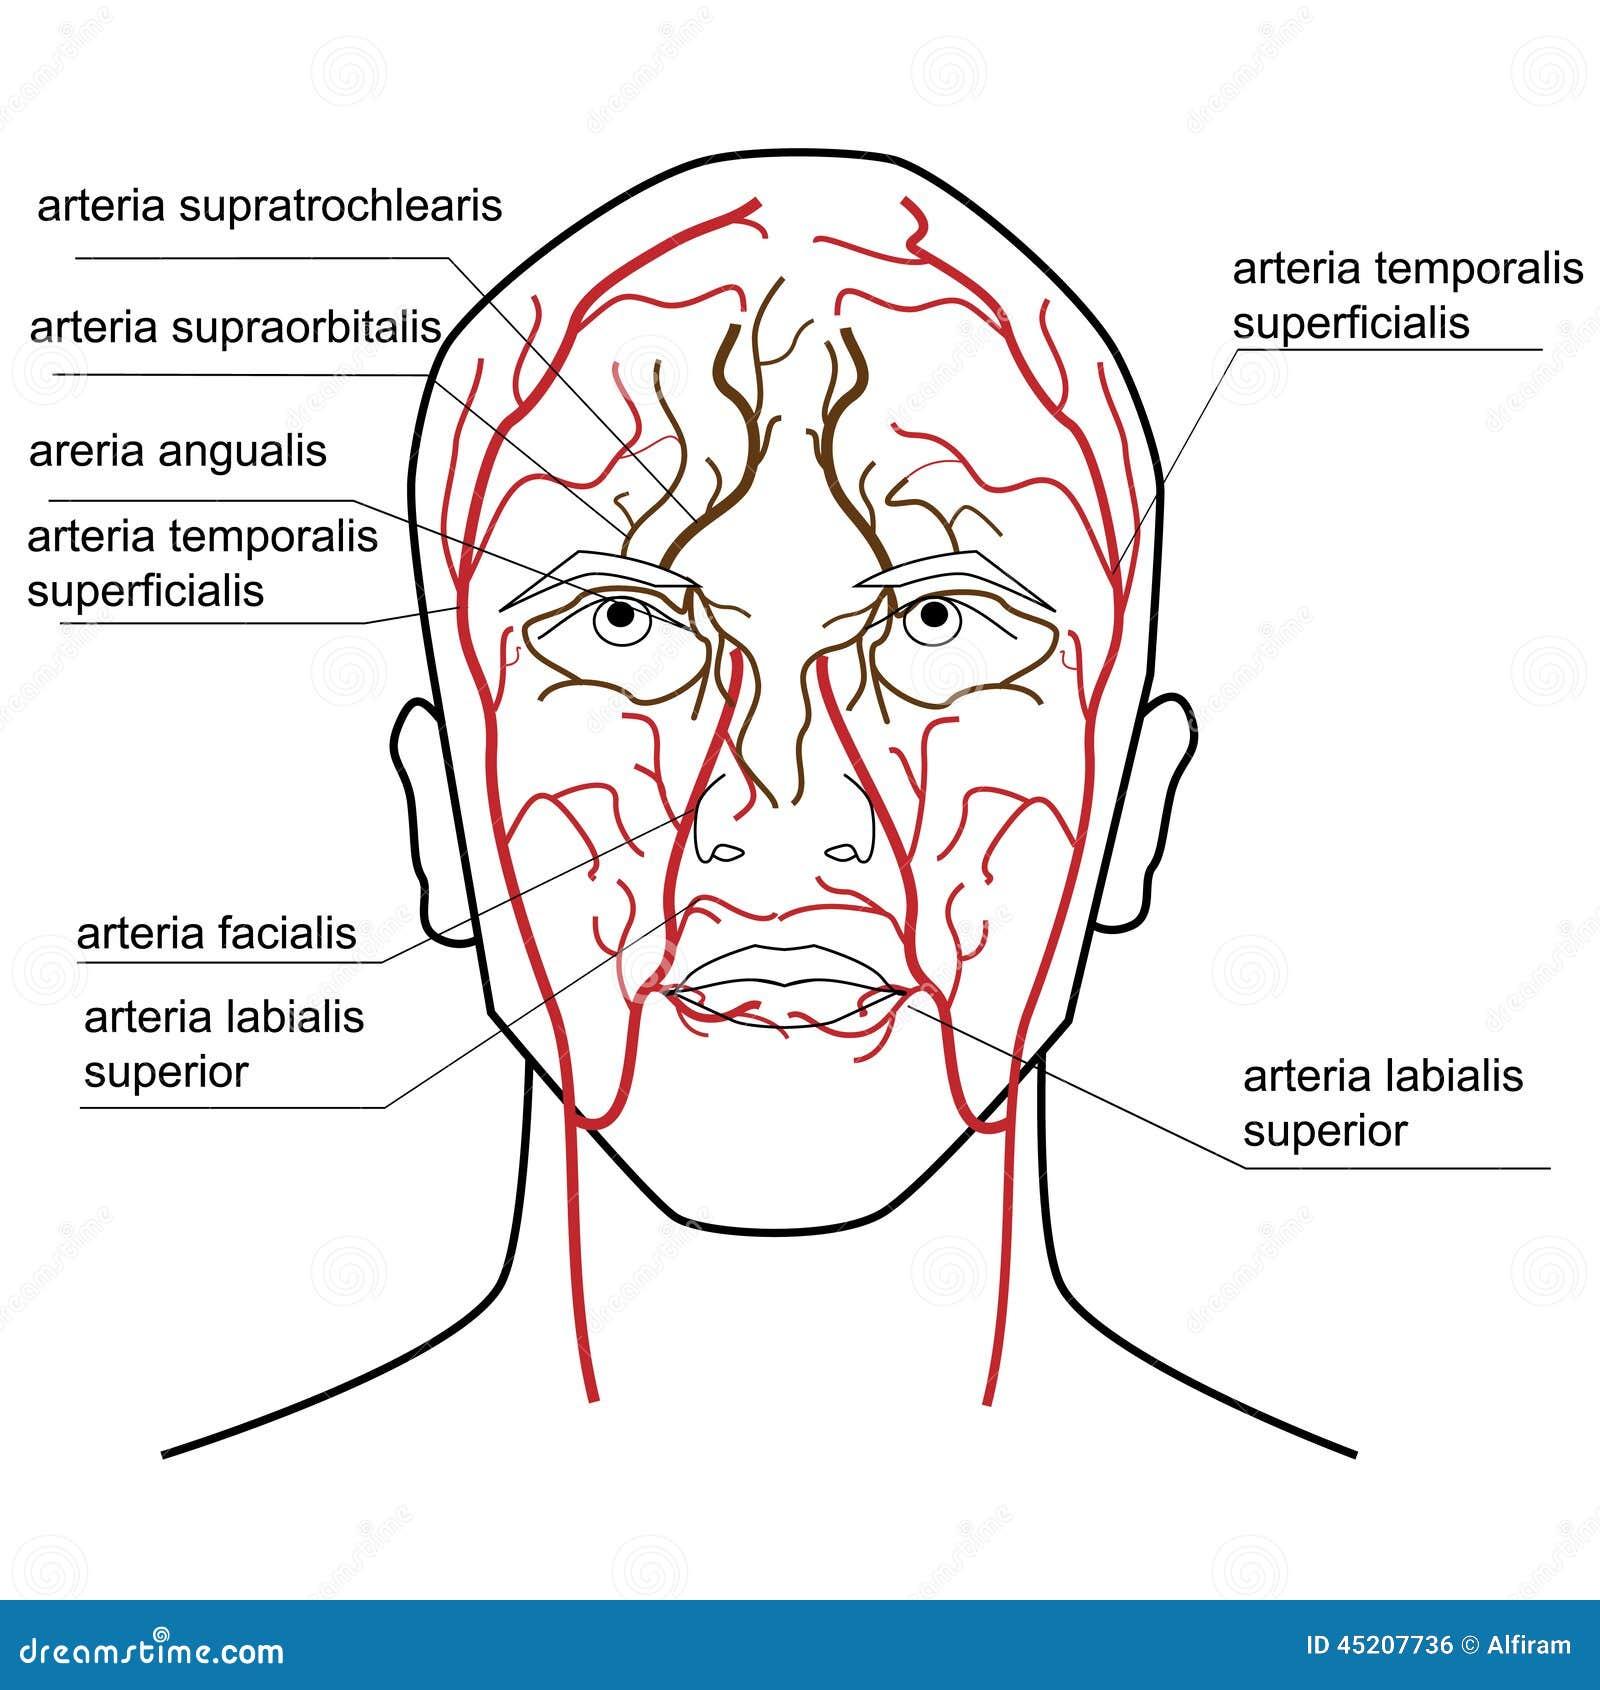 Fluxo sanguíneo da cabeça